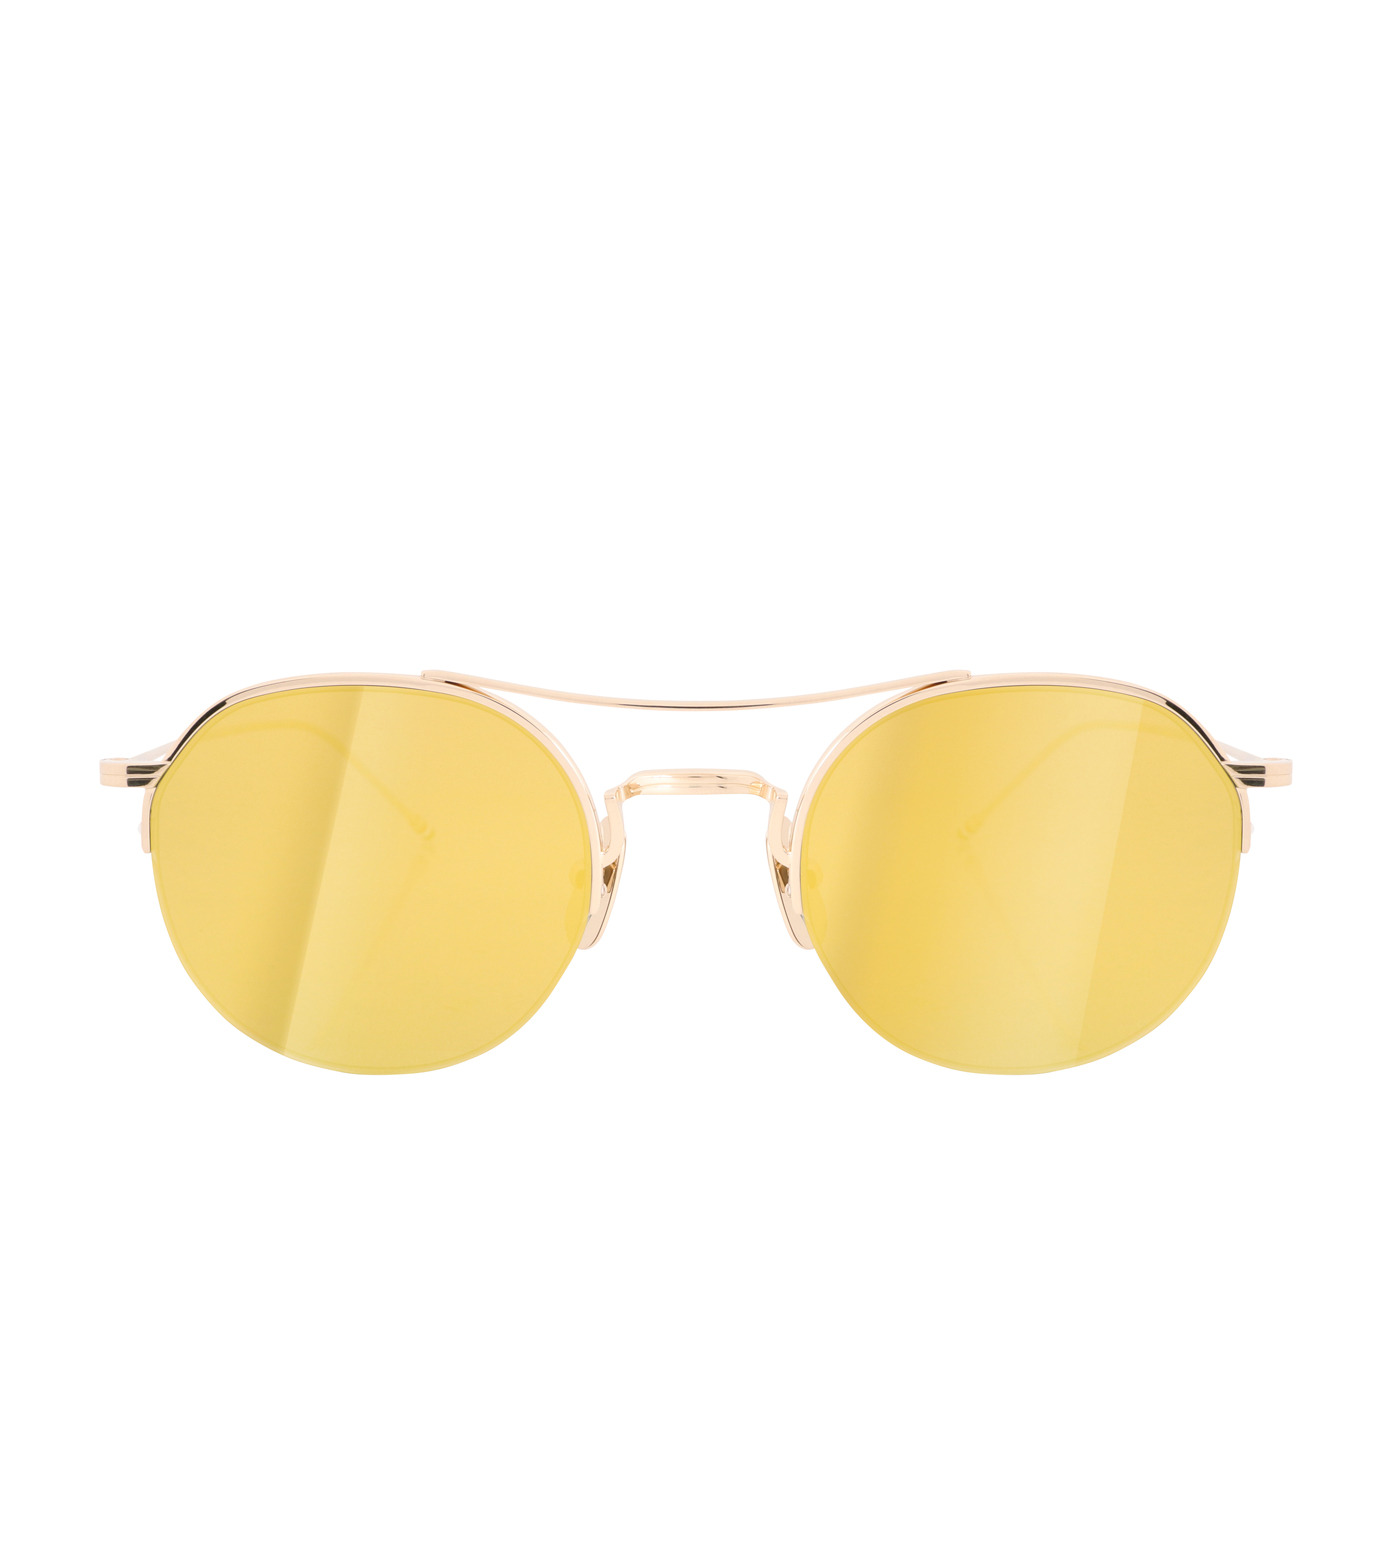 Thom Browne Eye Wear(トム・ブラウン・アイウェア)のTeardrop Gold Lens-GOLD(アイウェア/eyewear)-TB-903-A-T-2 拡大詳細画像3